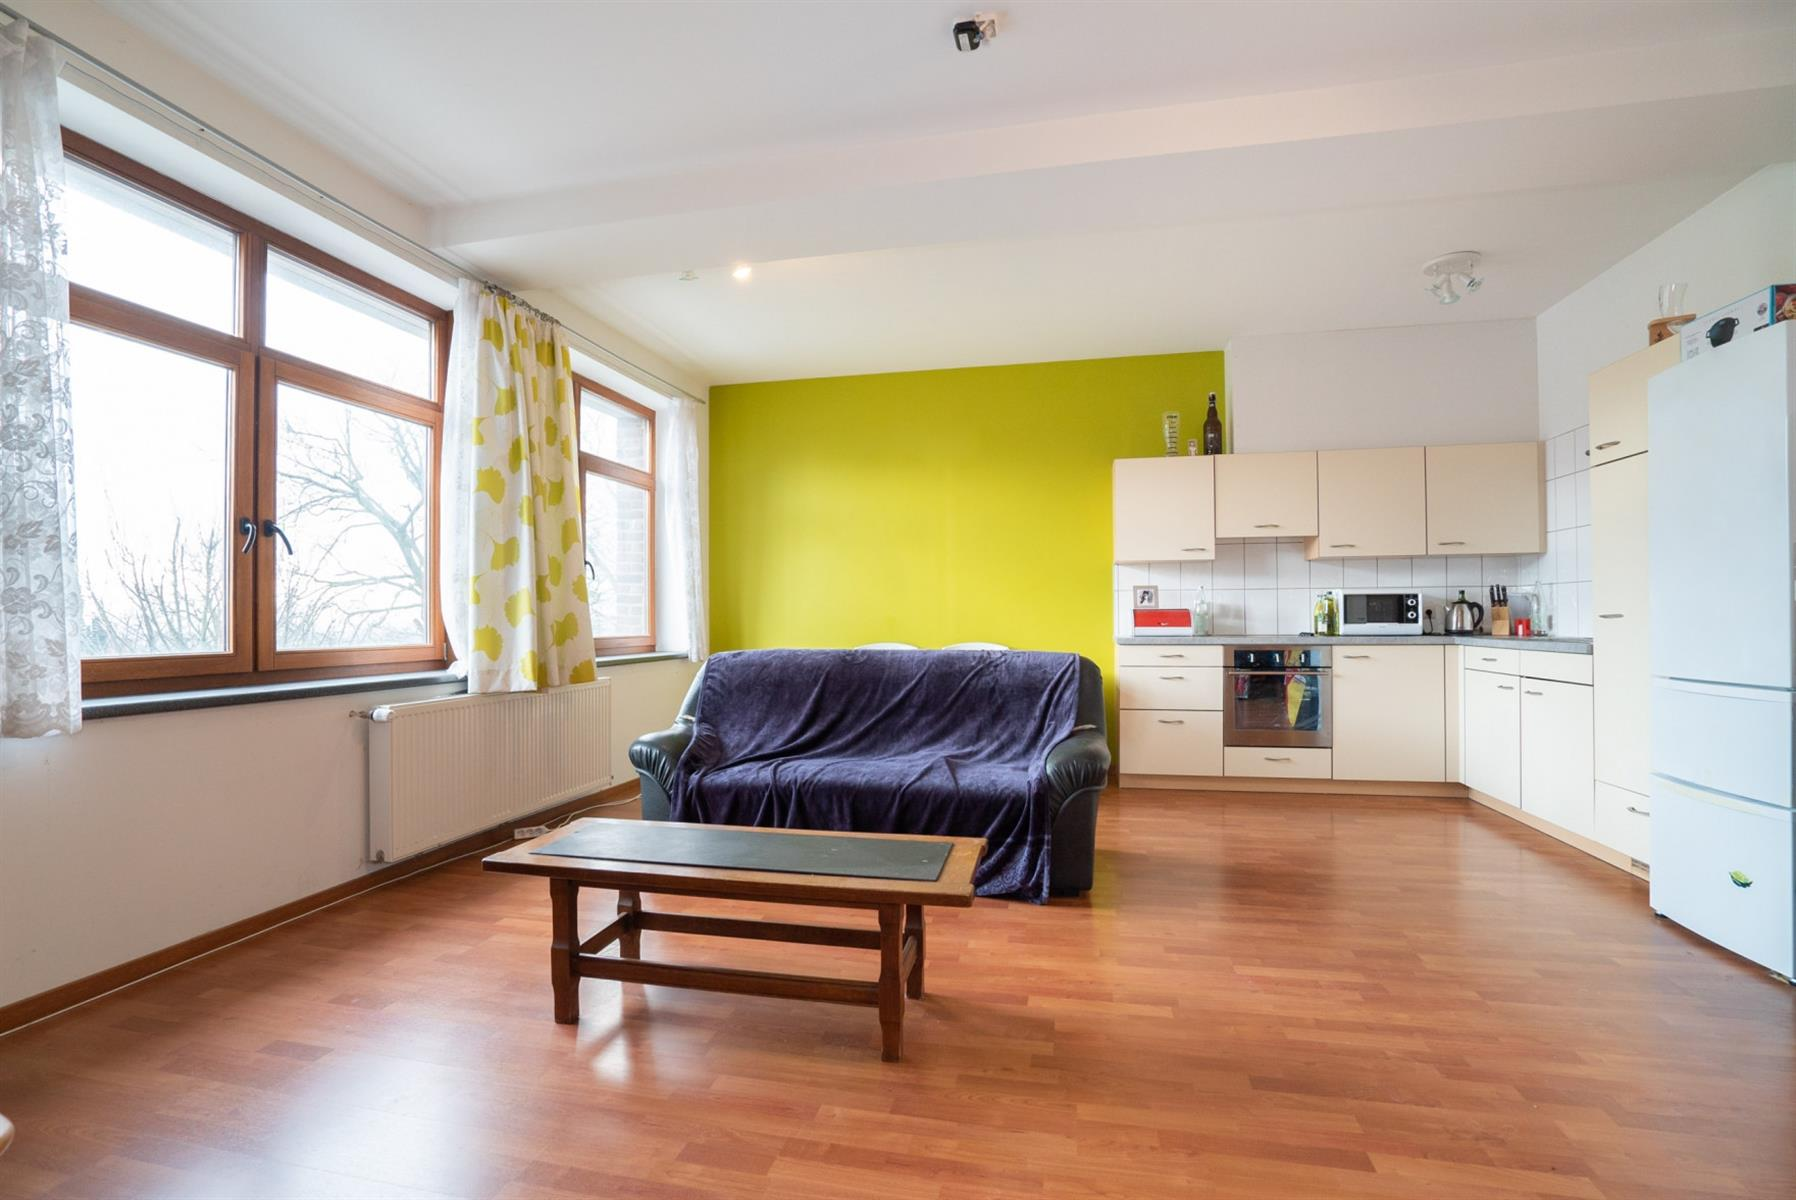 Appartement - Welkenraedt Henri-Chapelle - #4270873-1